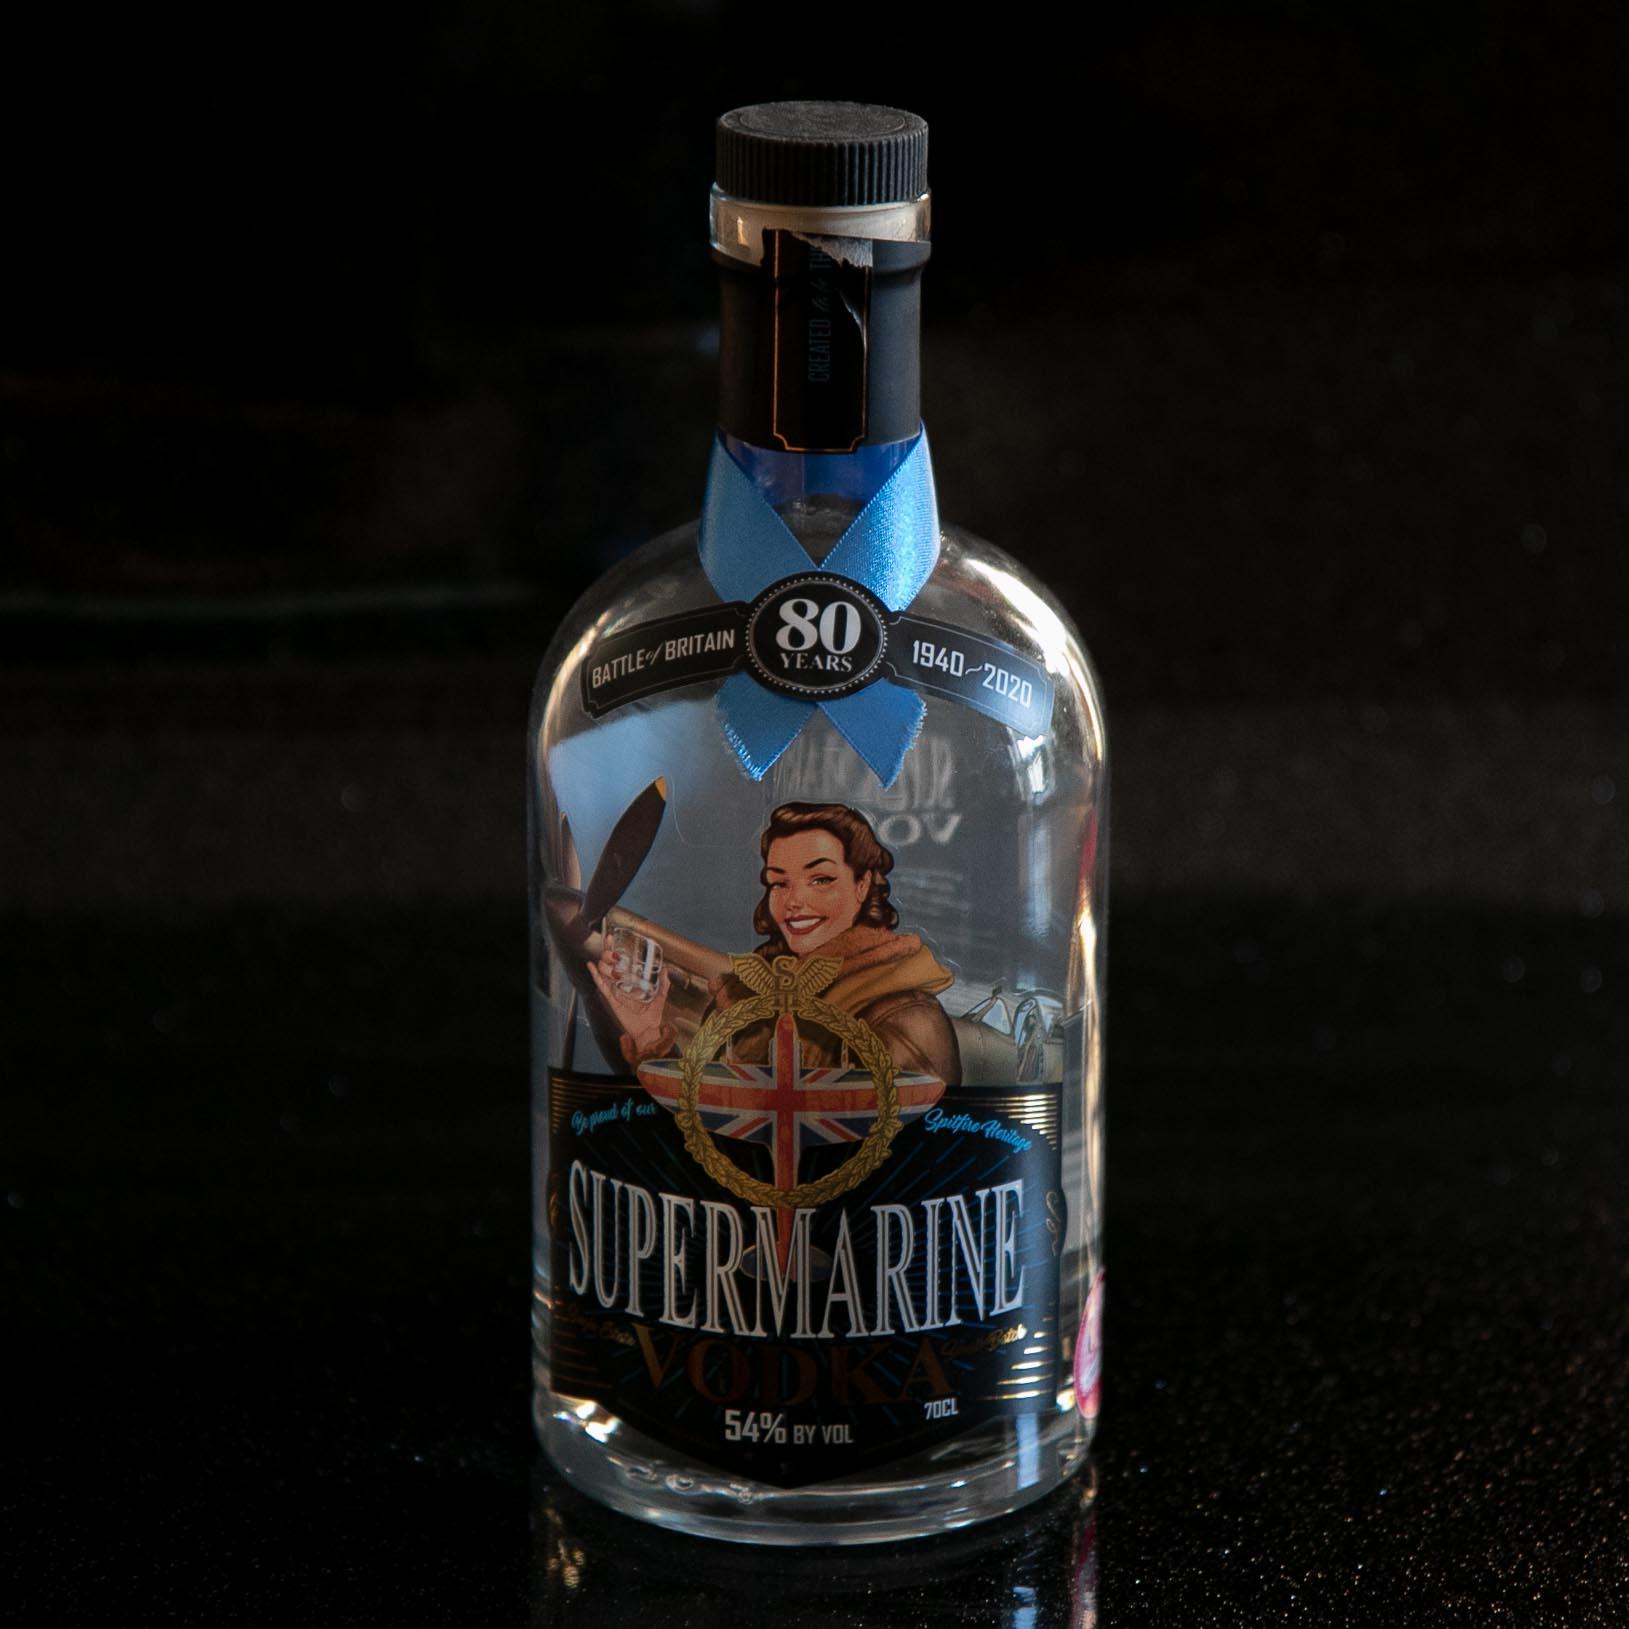 Supermarine Vodka